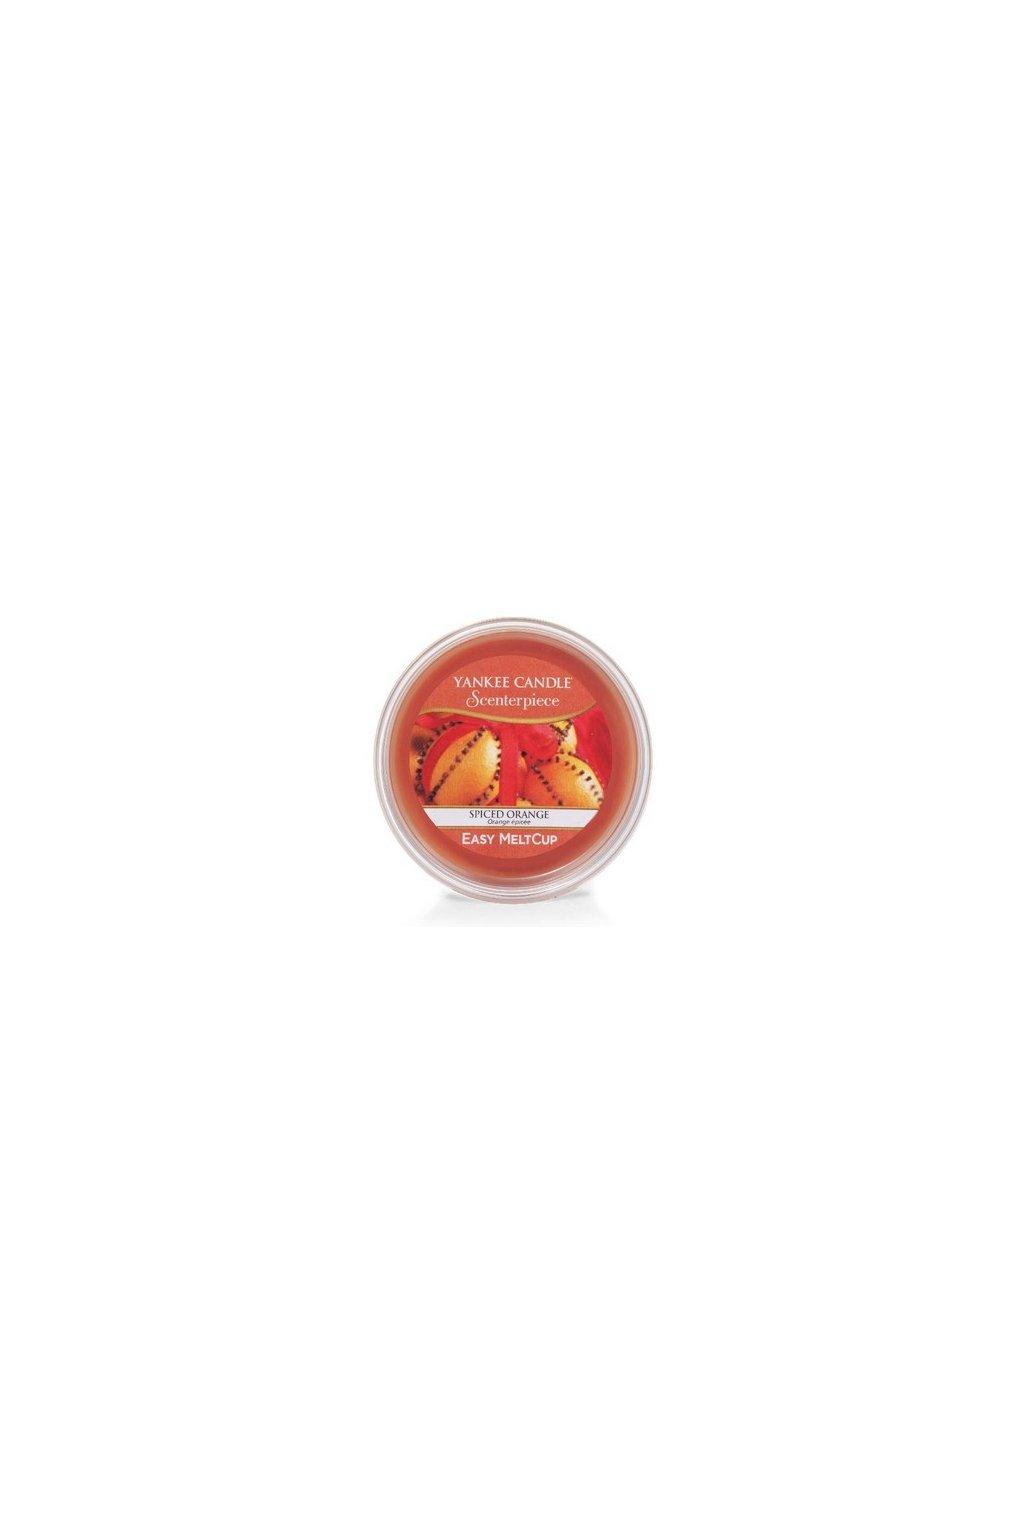 Yankee Canle Scenterpiece Meltcup Vosk Spiced Orange